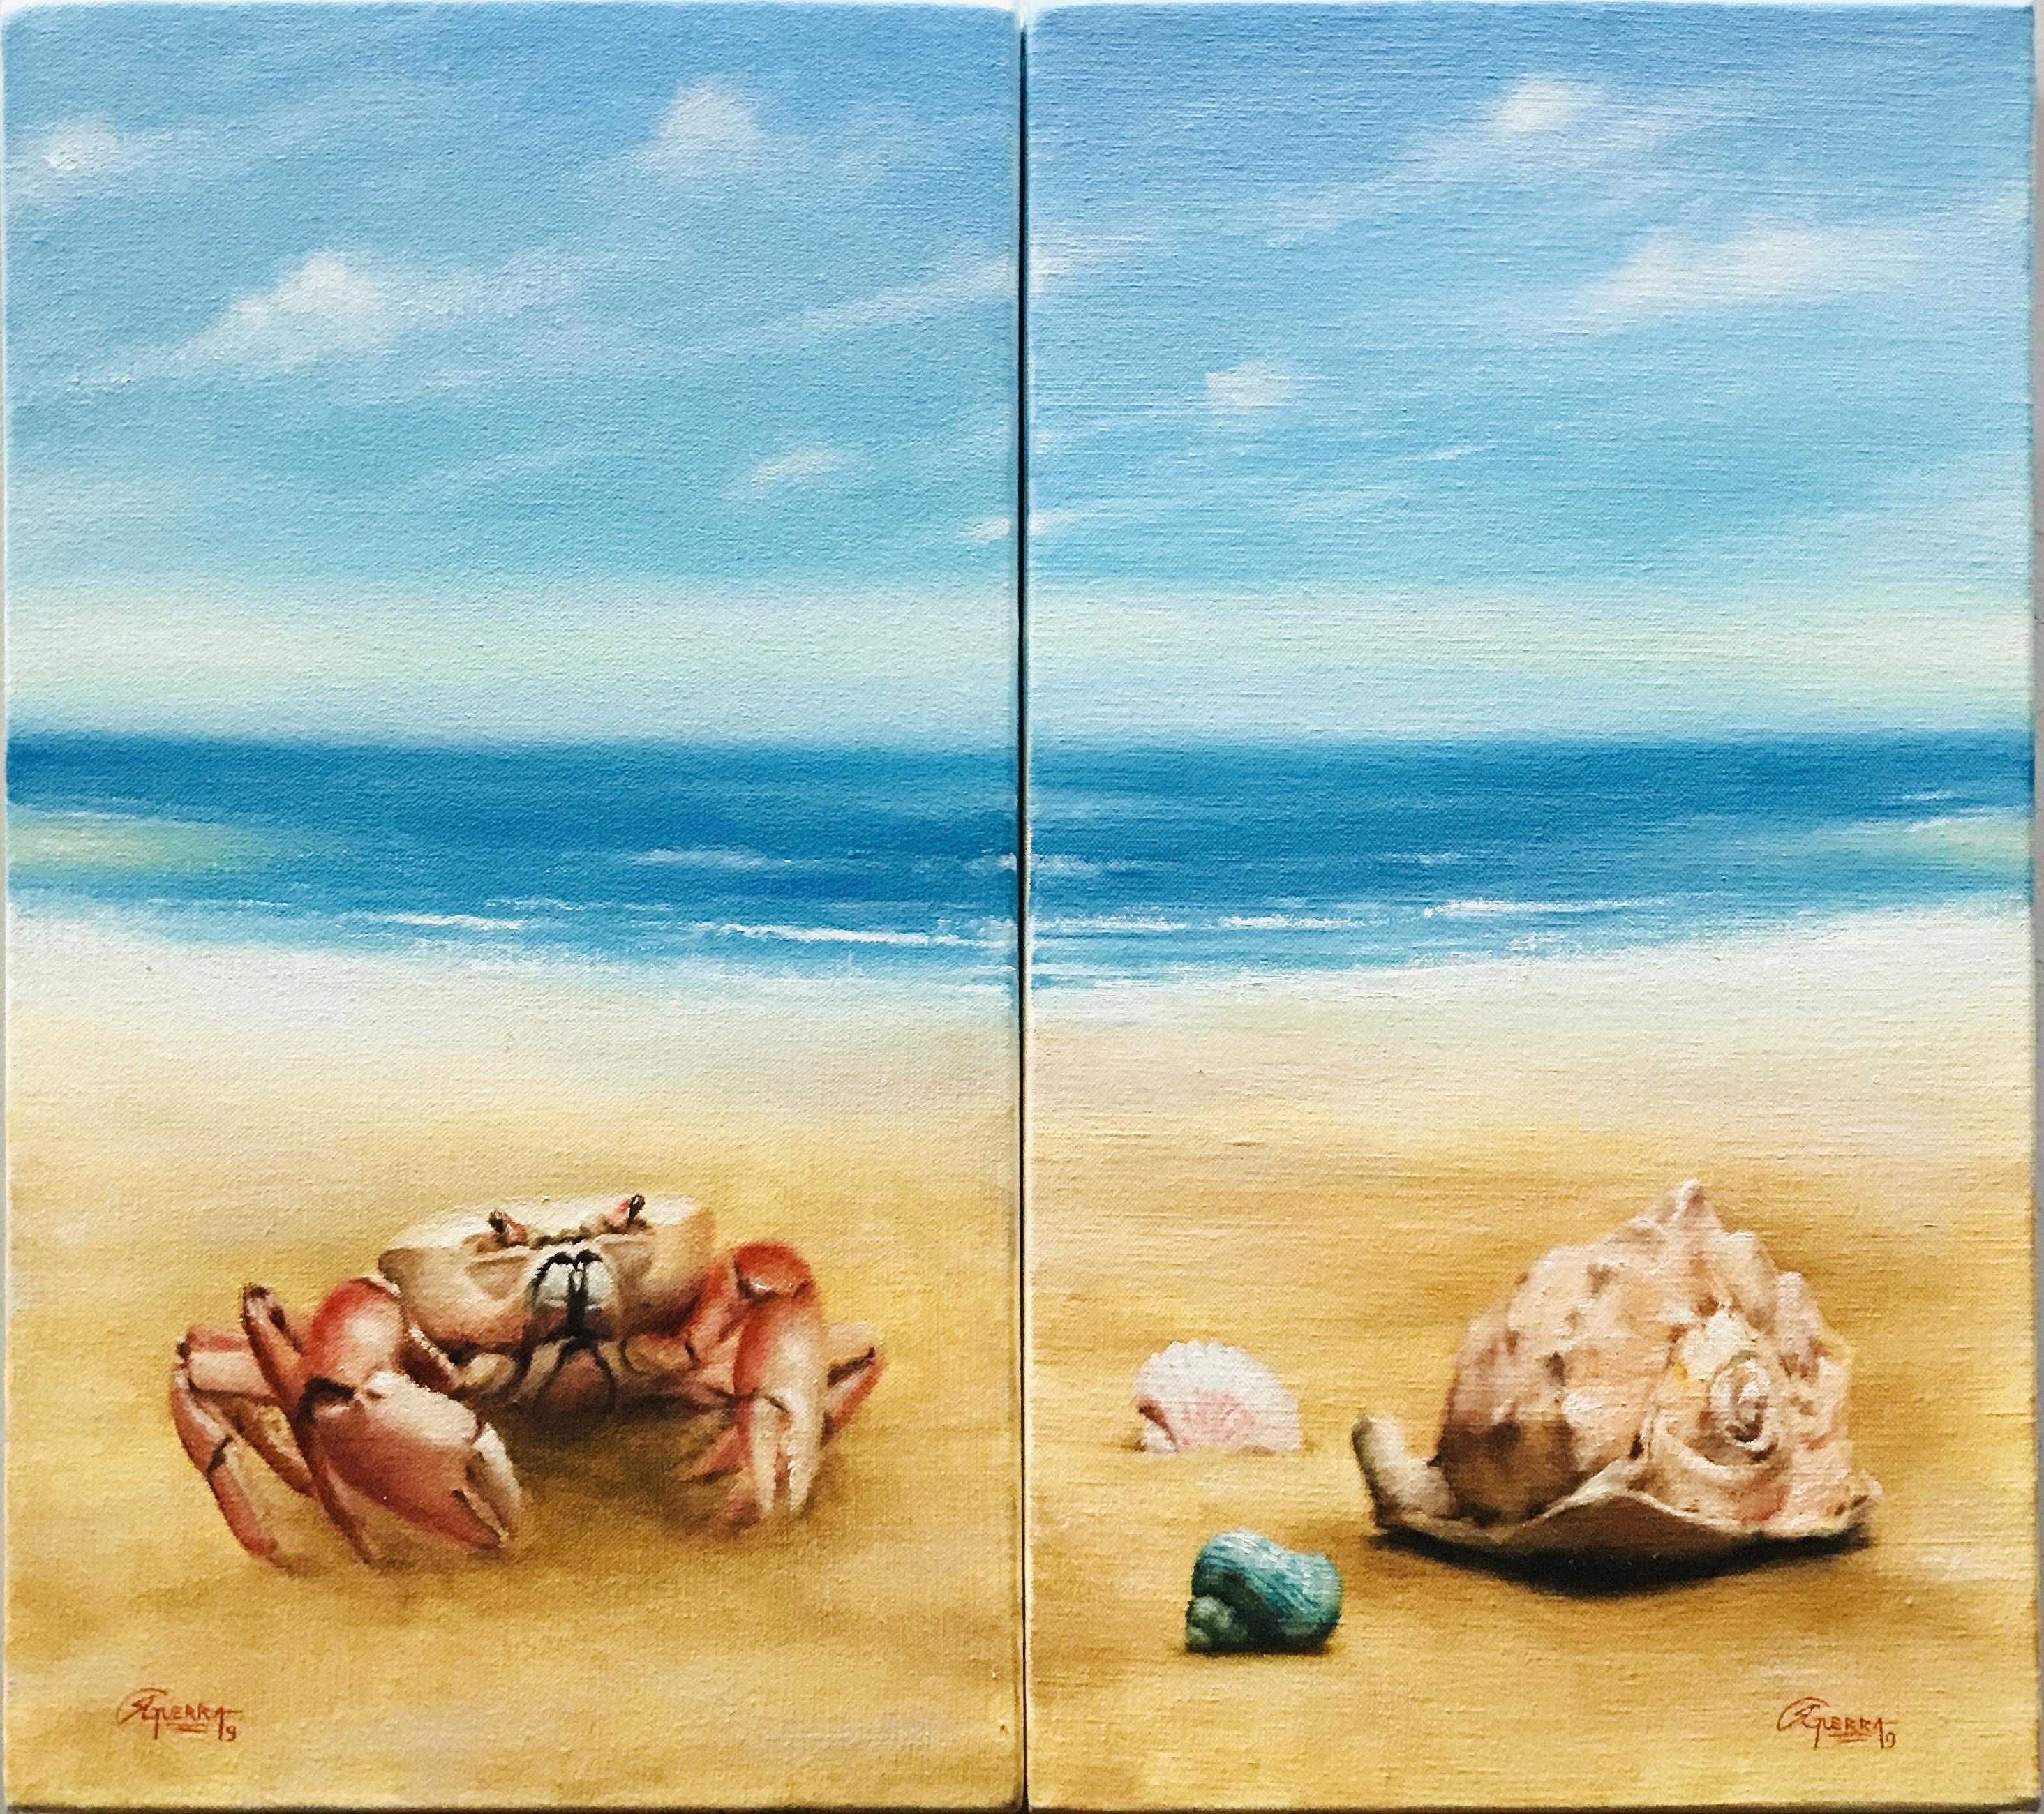 Paisagens de Praia com Carangueijo e Conchas, Rafael Guerra